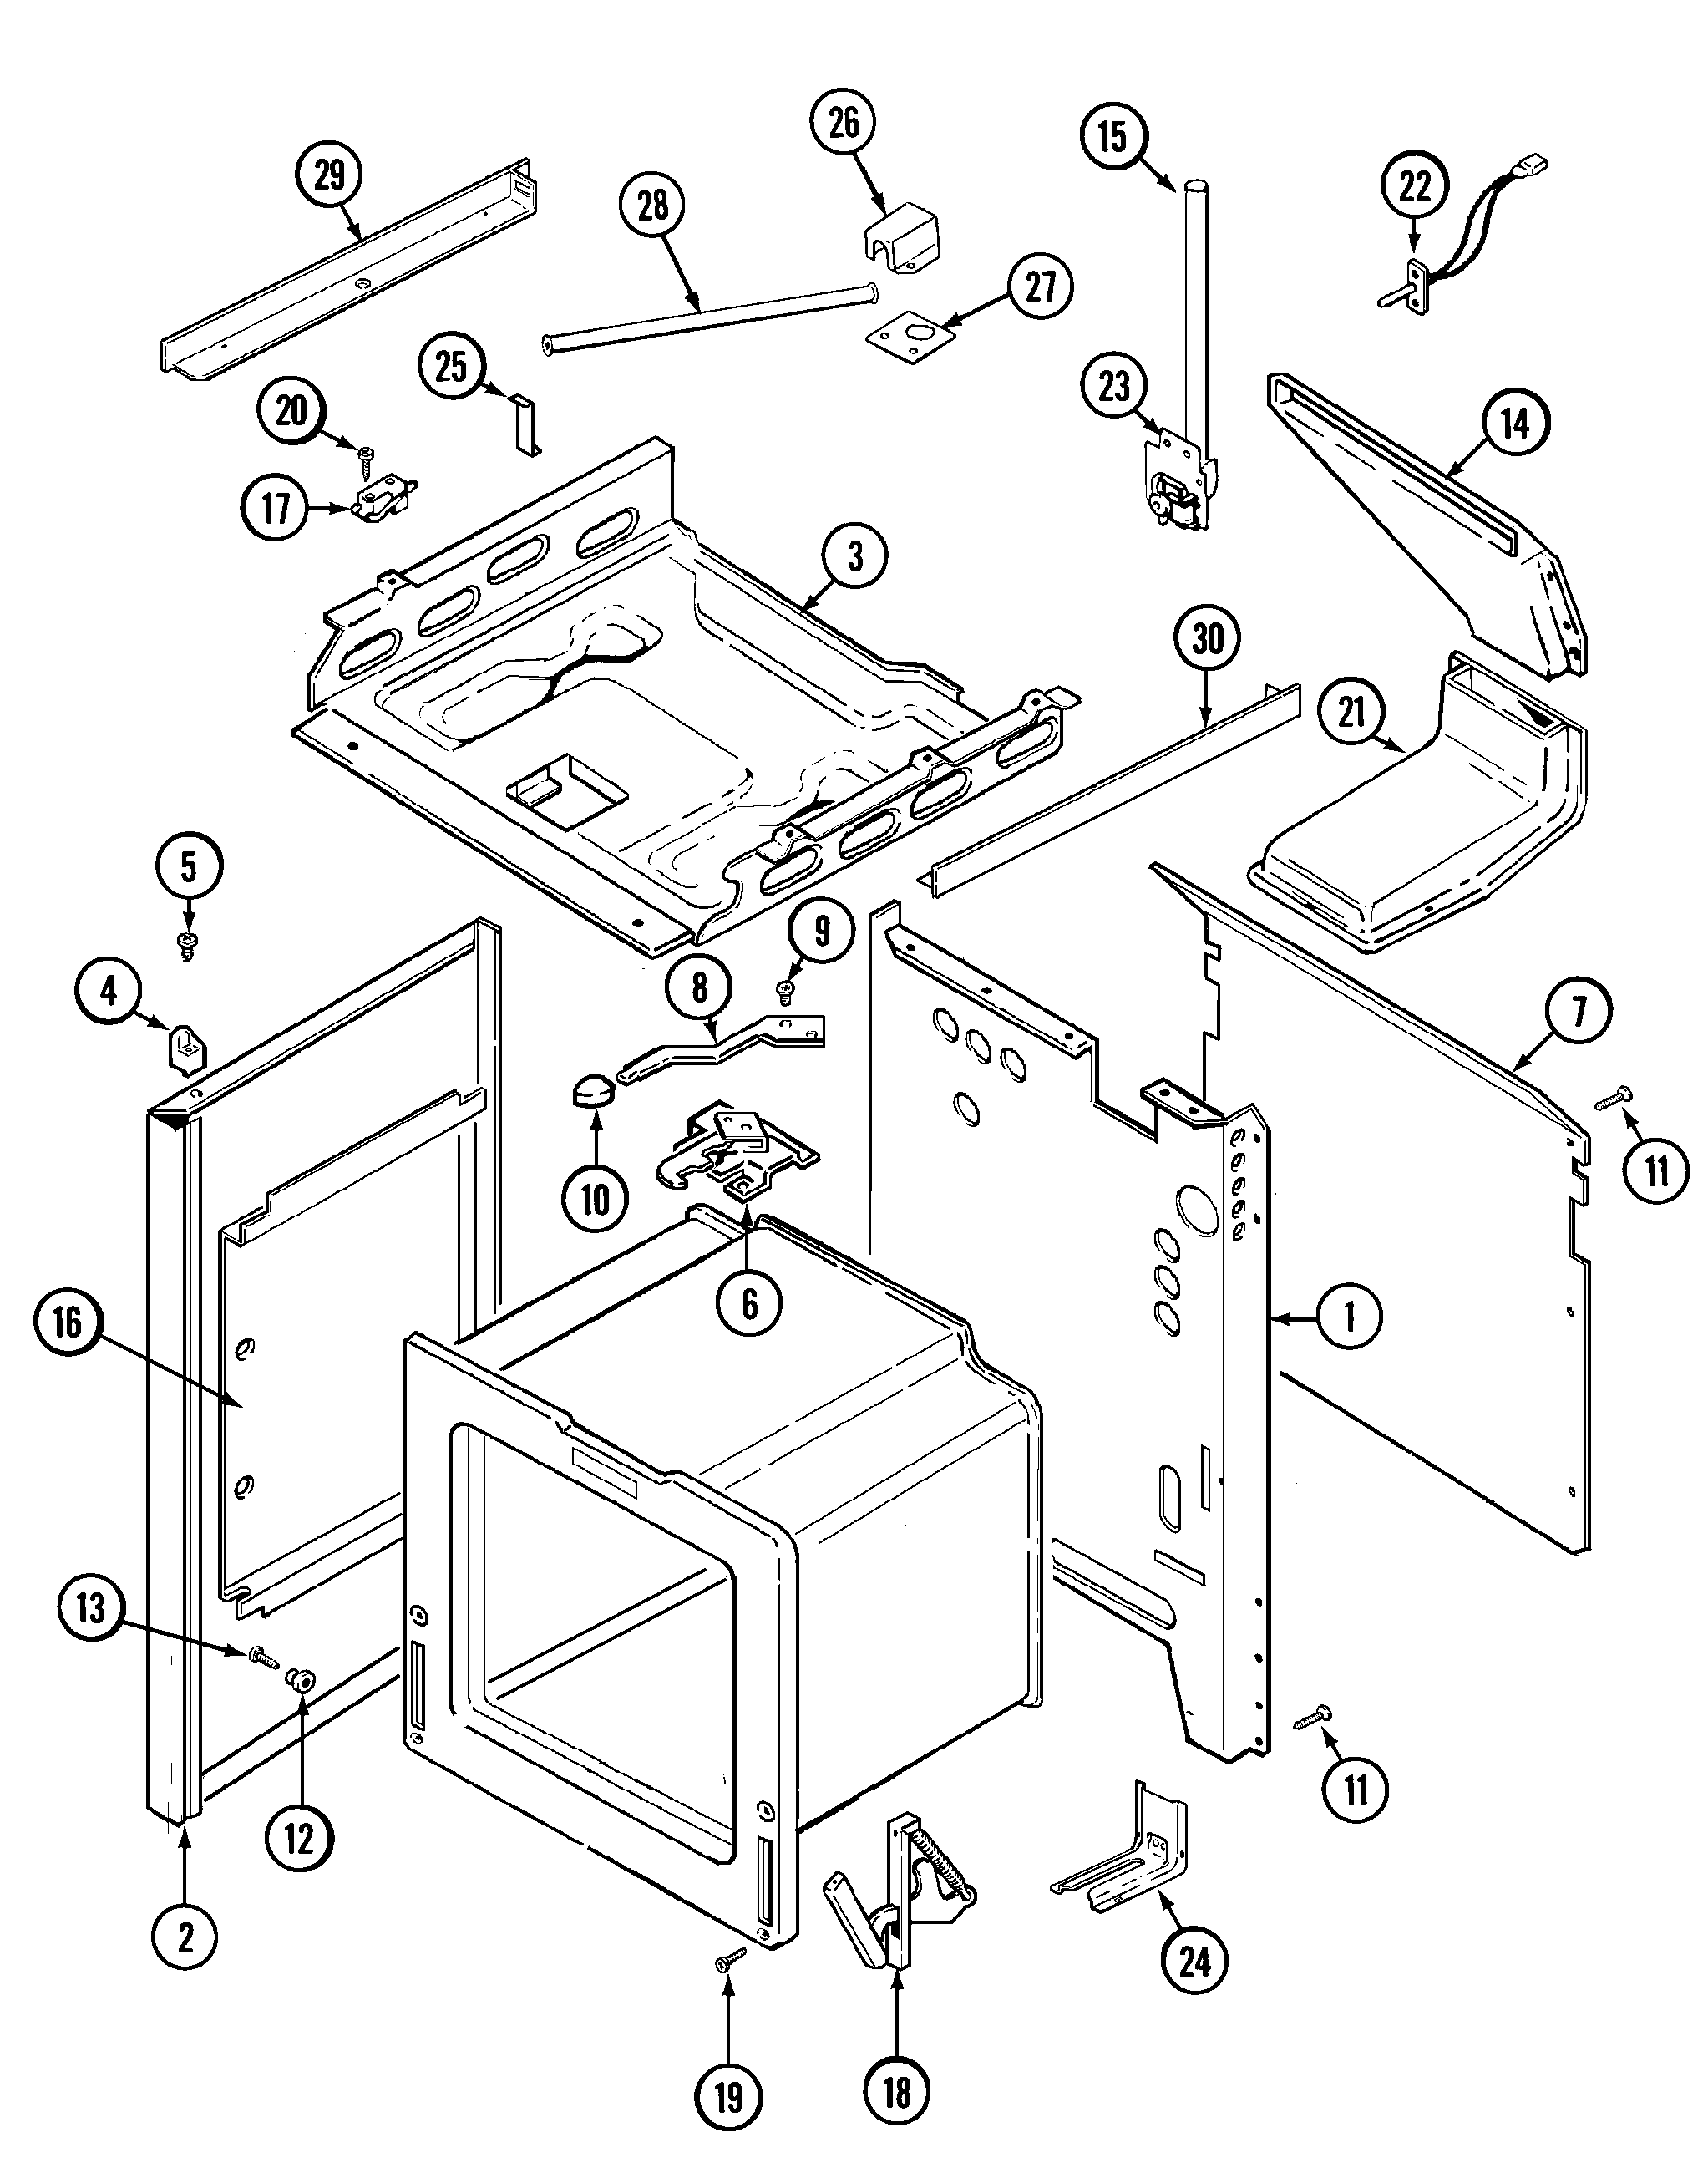 6498vtv gas range body parts diagram